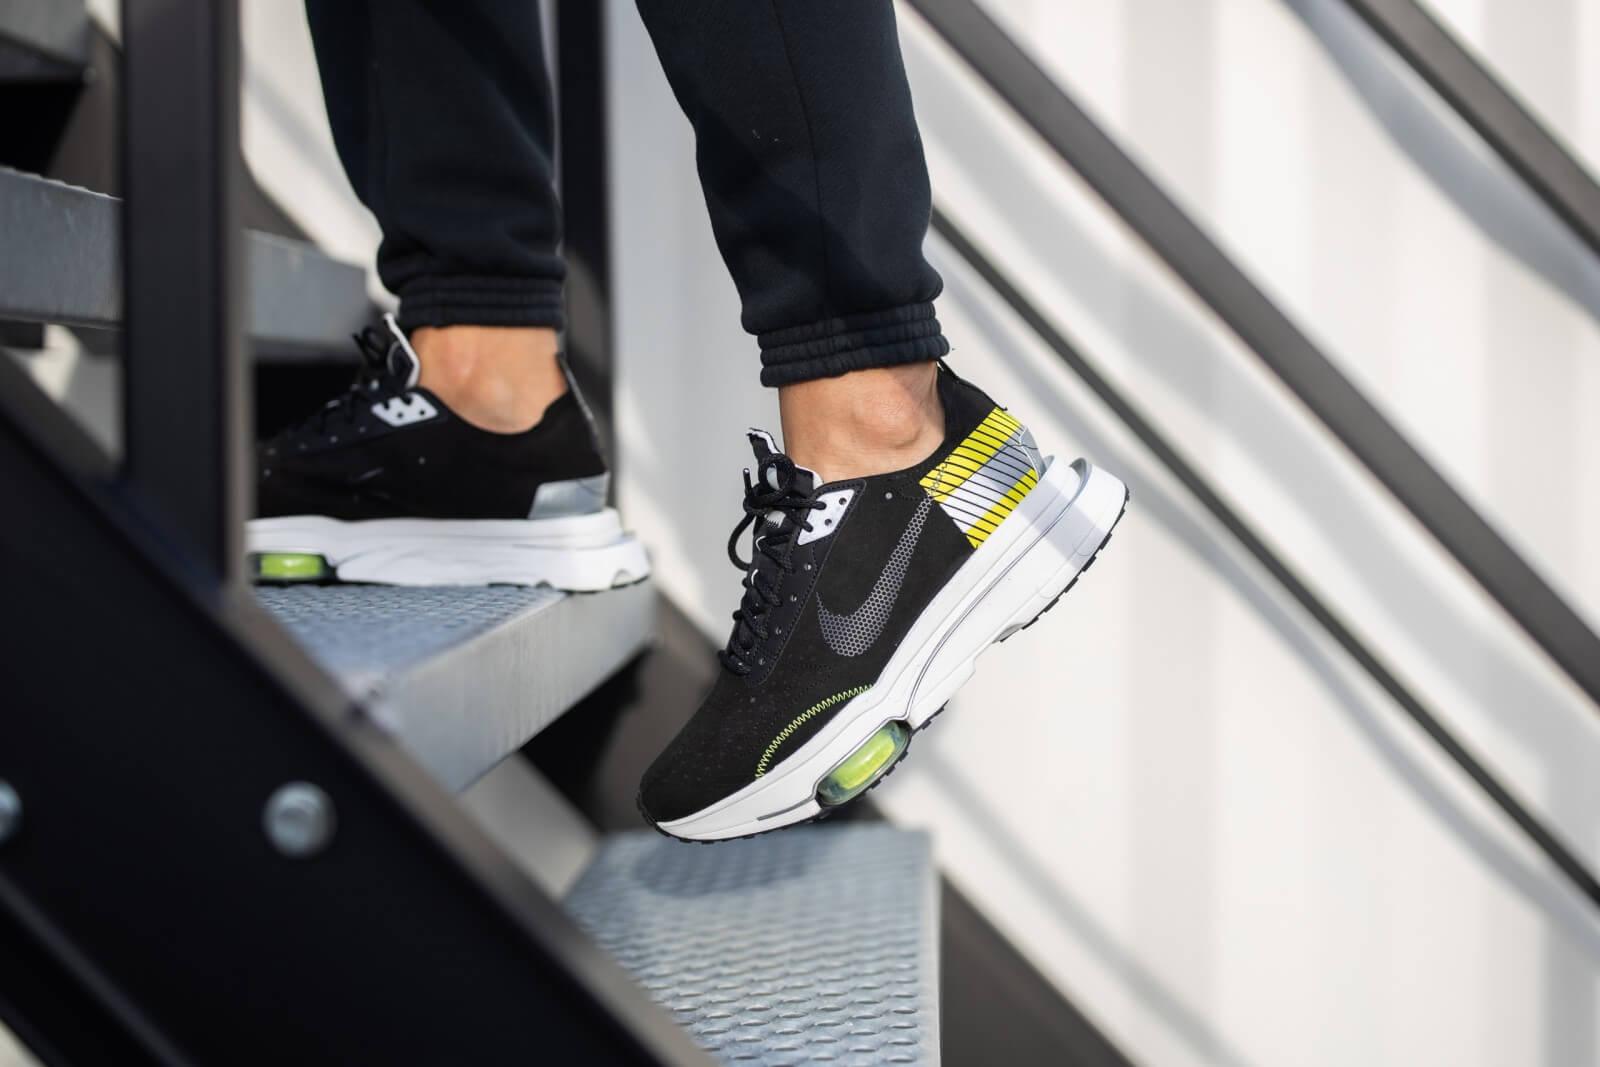 Nike Air Zoom-Type SE 3M Black/Anthracite-Summit White-Volt